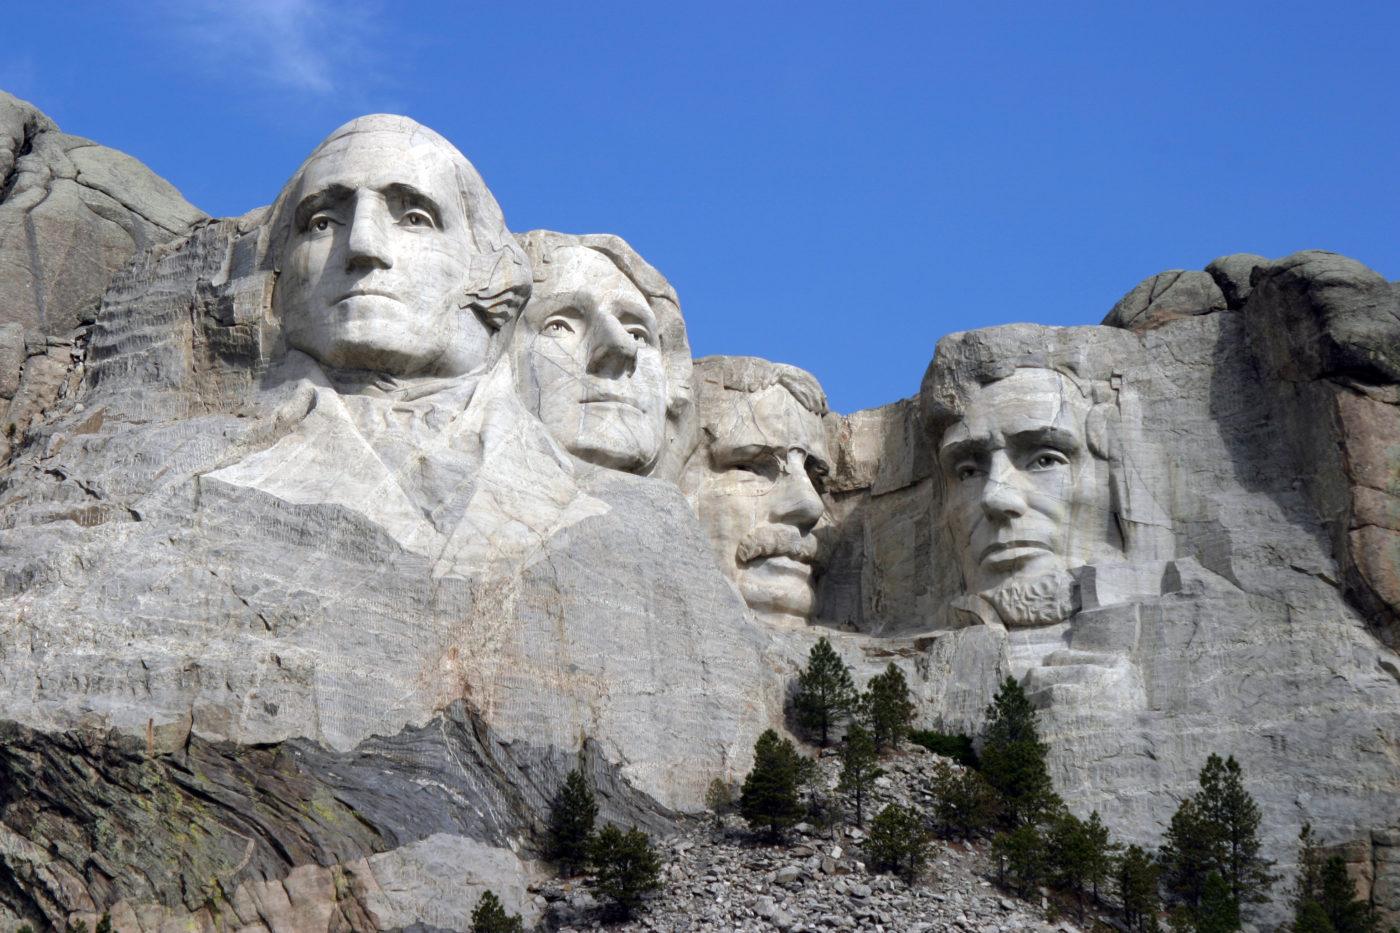 U.S. president landmarks